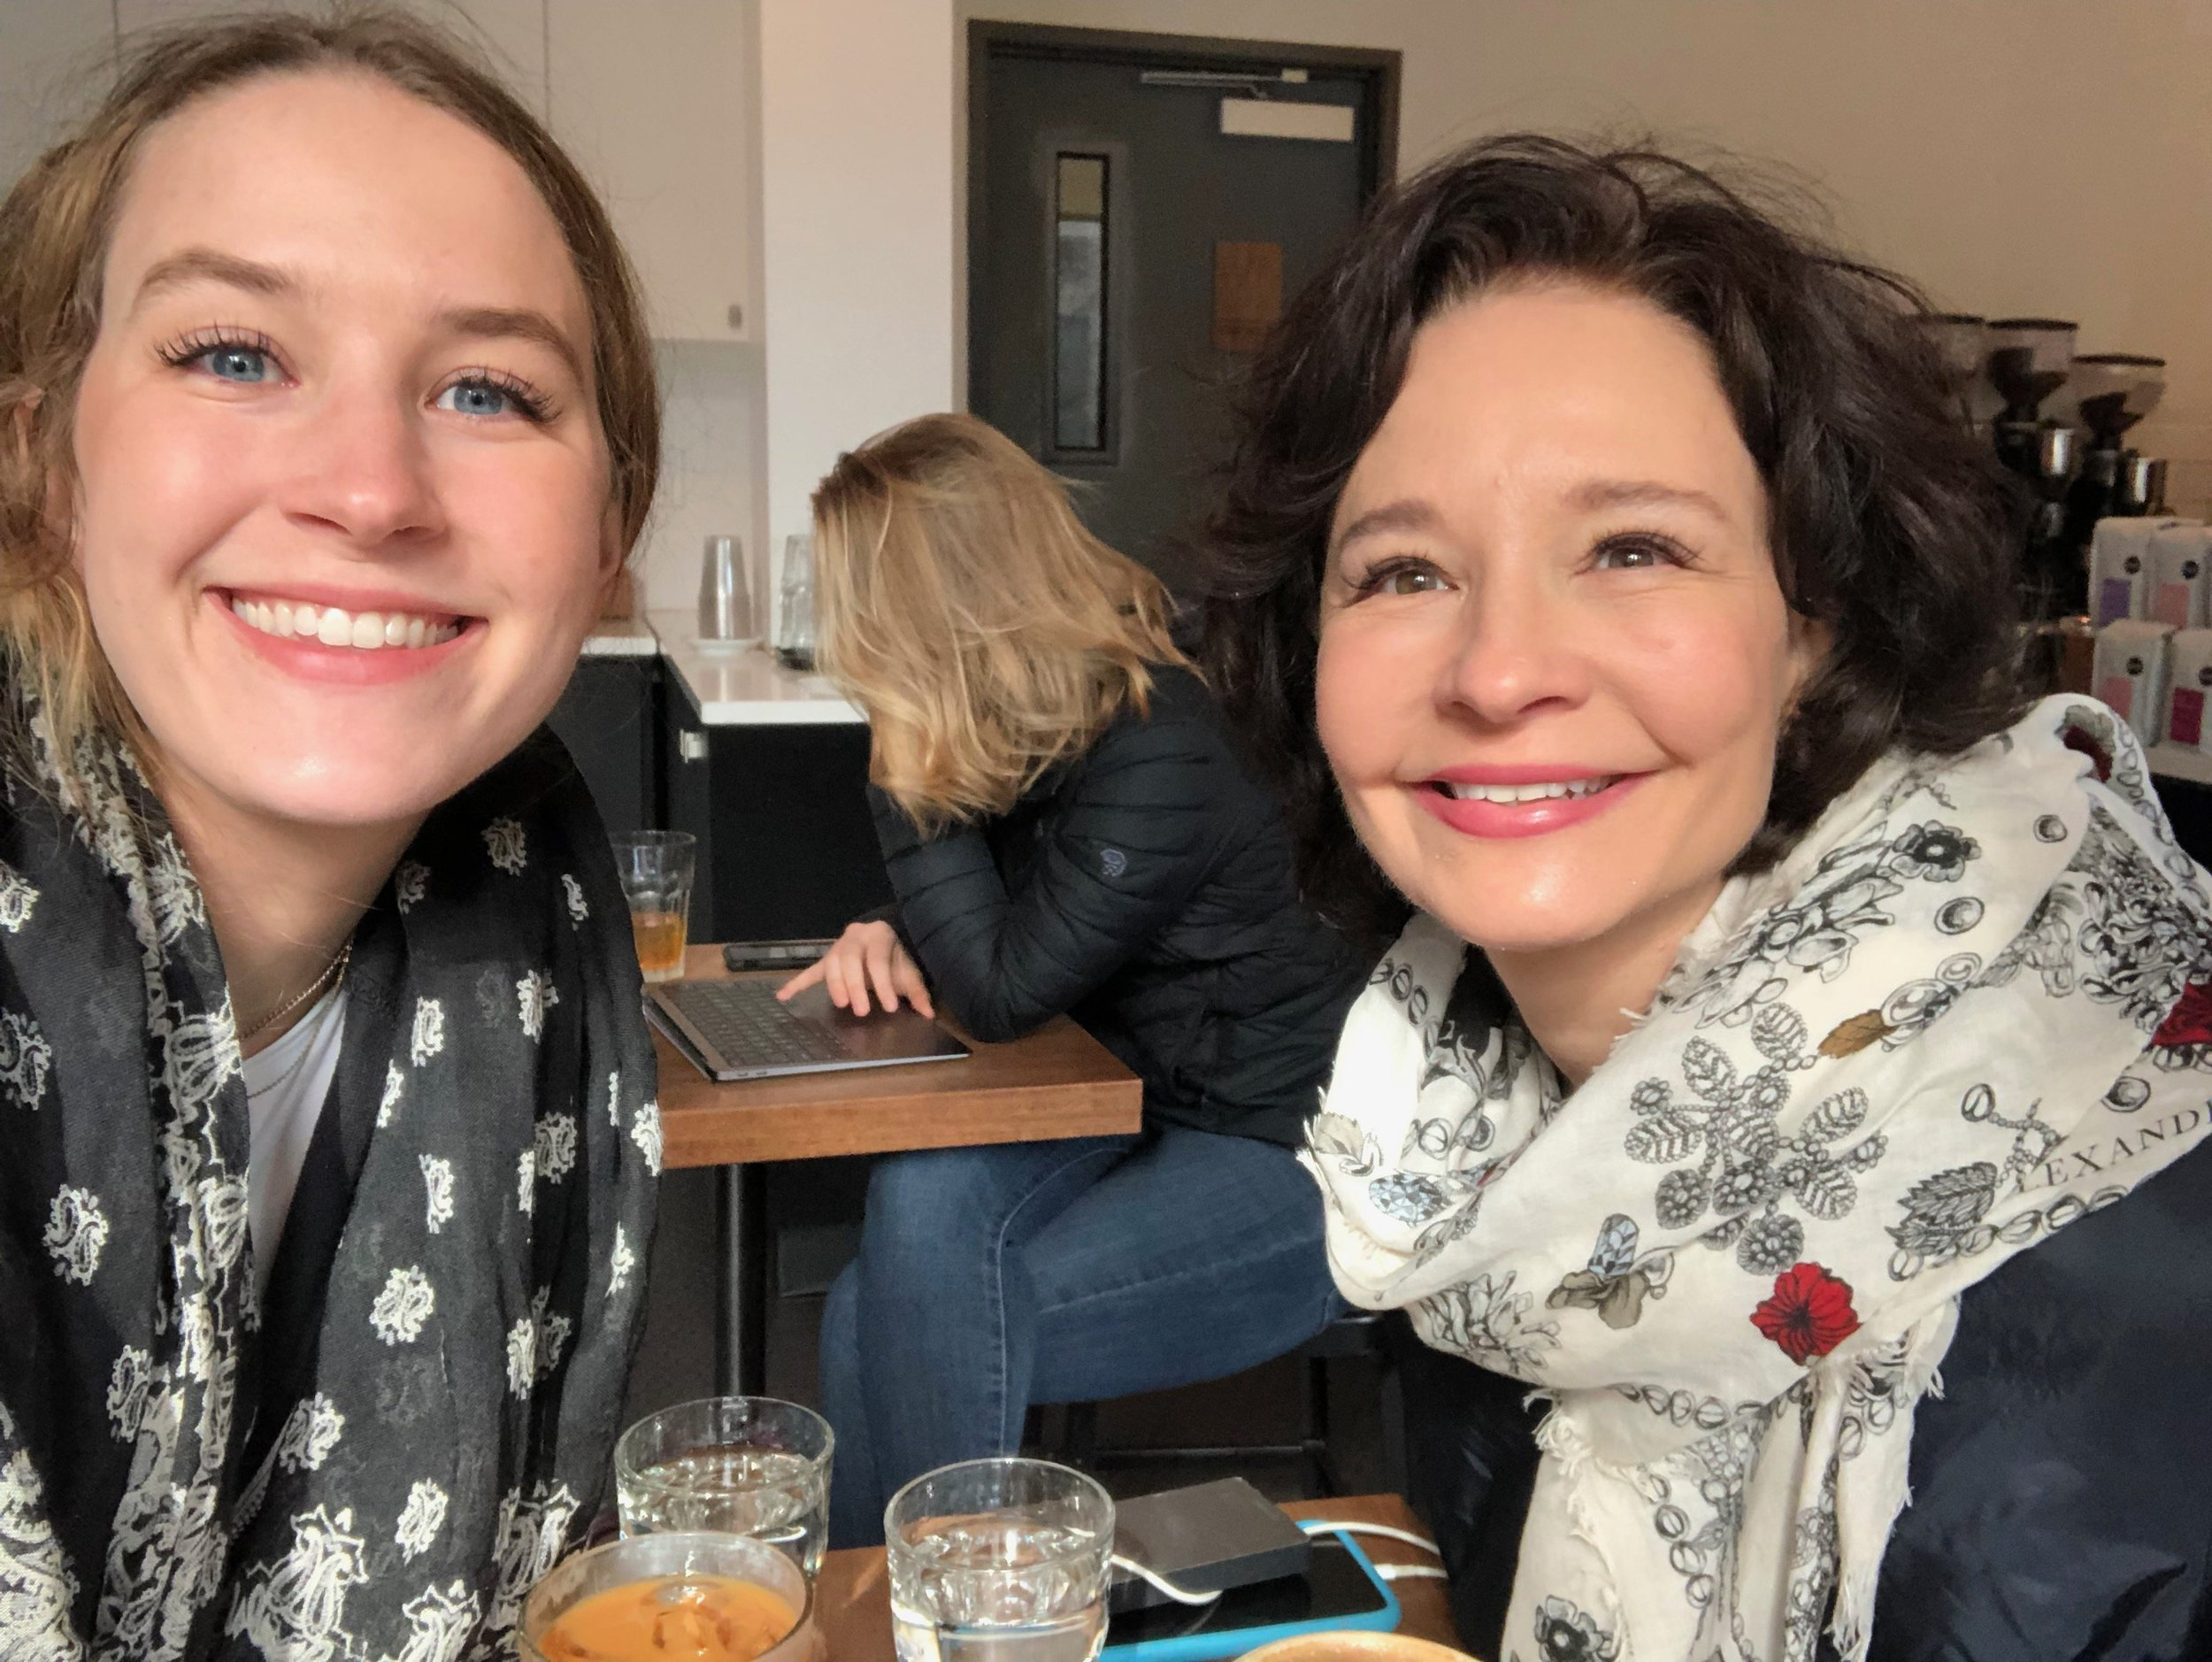 me-and-my-mom.jpg